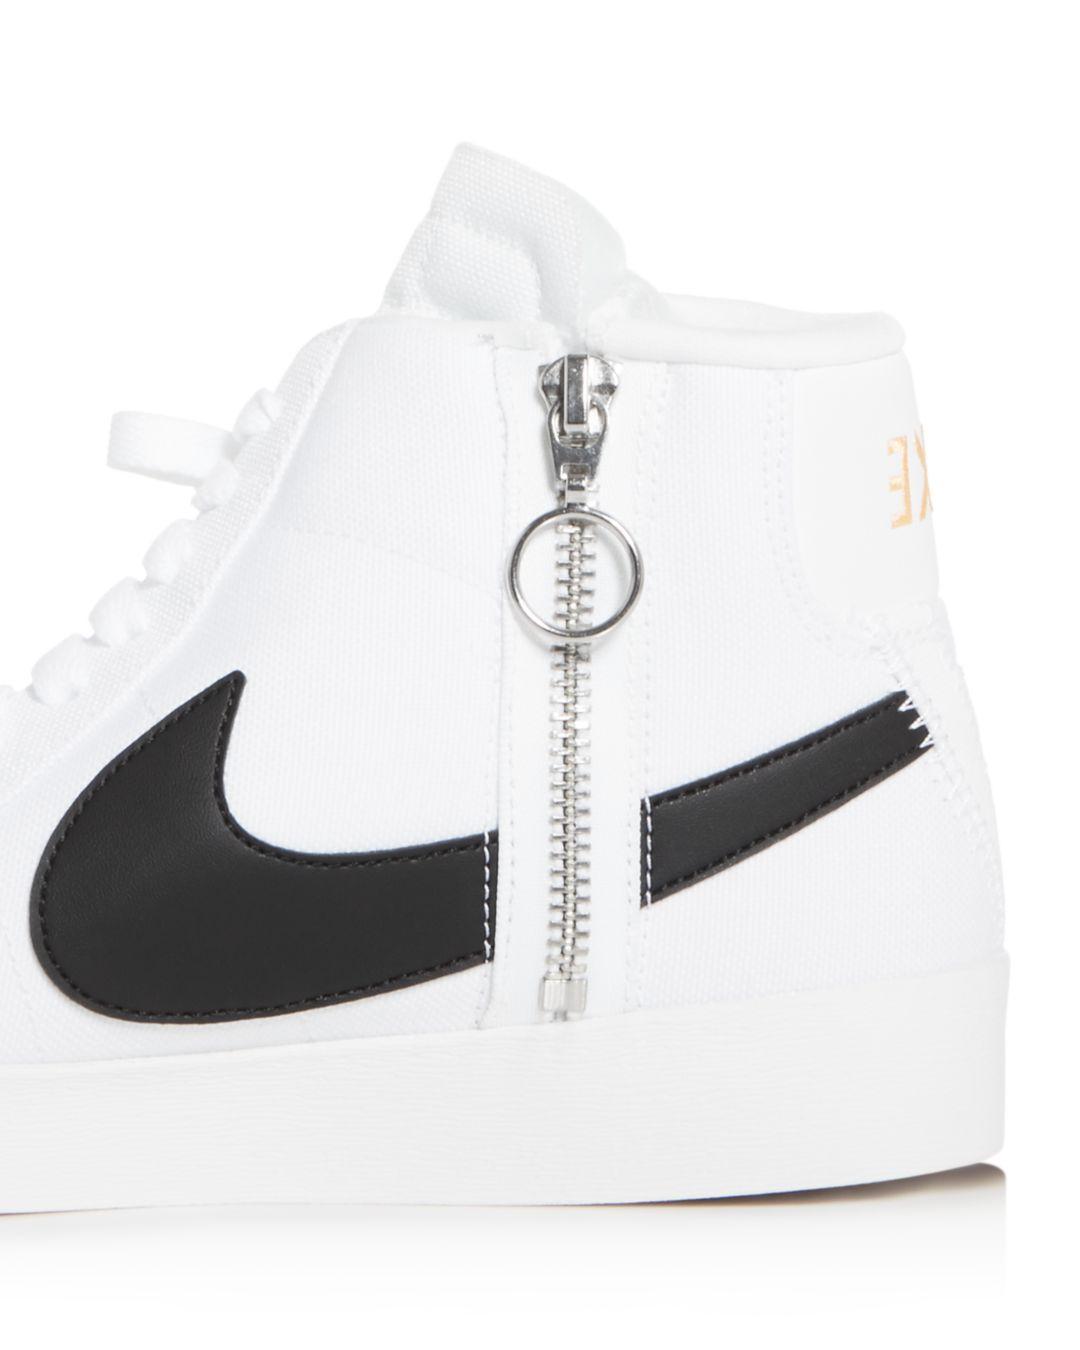 Nike Canvas Blazer Mid Rebel High Top